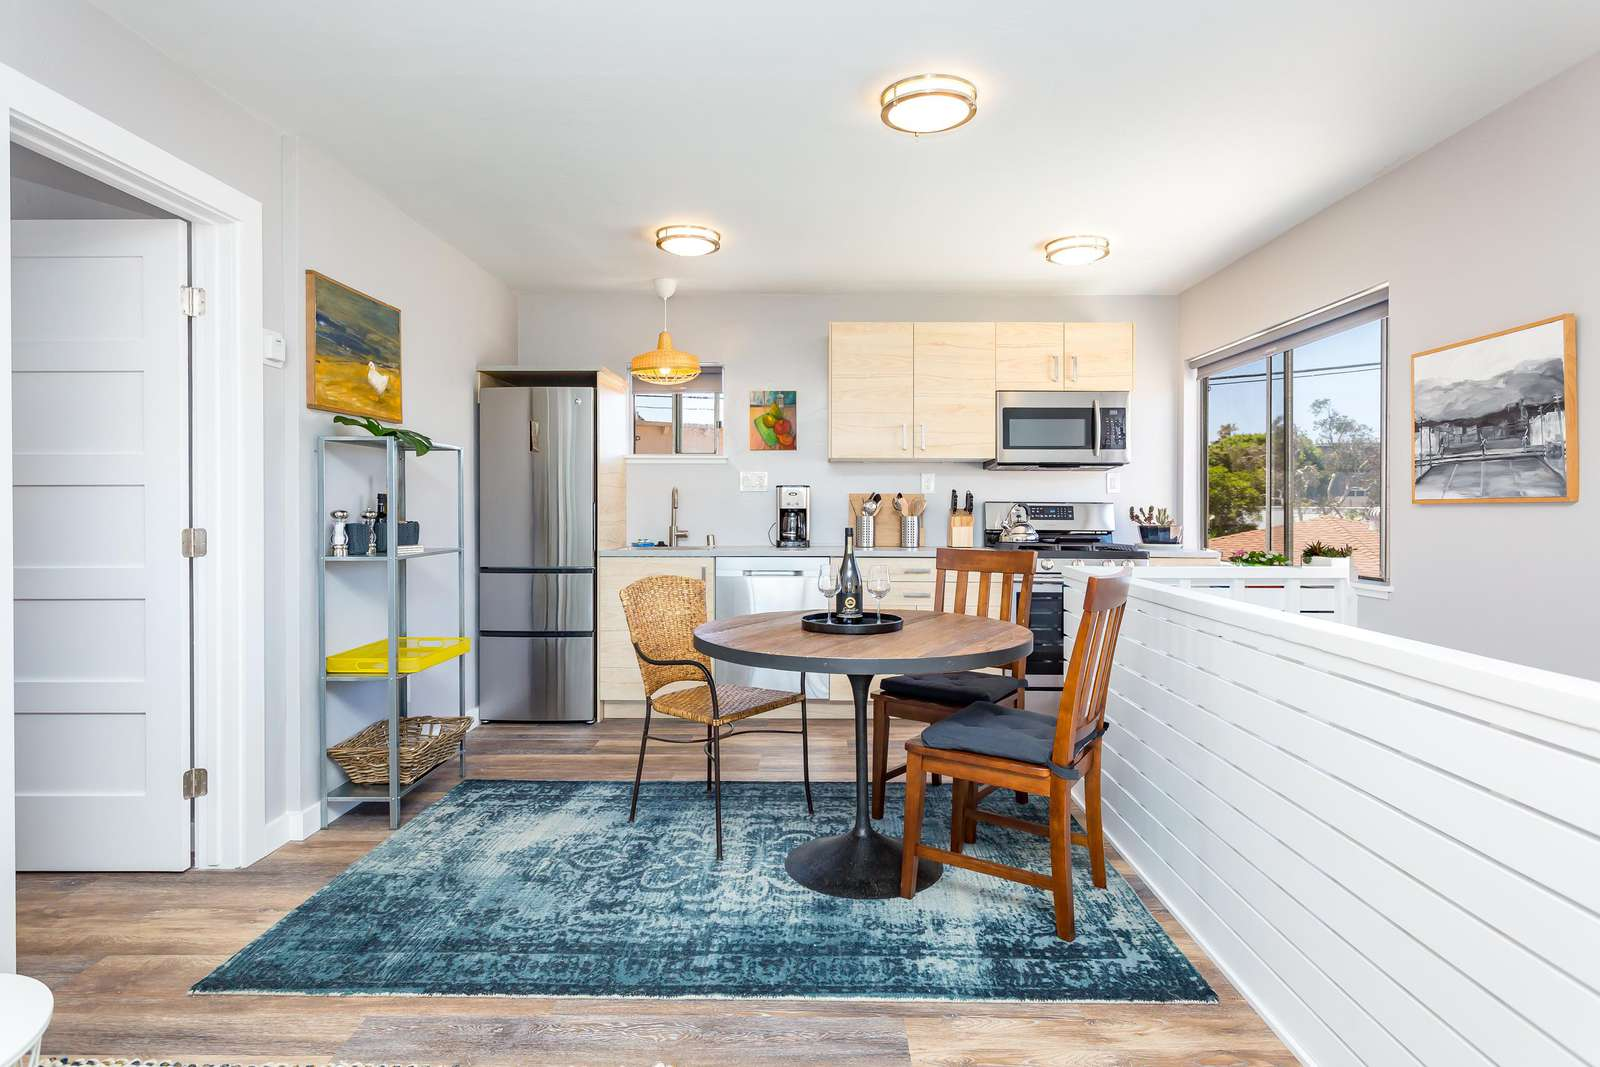 Villa Rey 1 Bedroom Suite - property